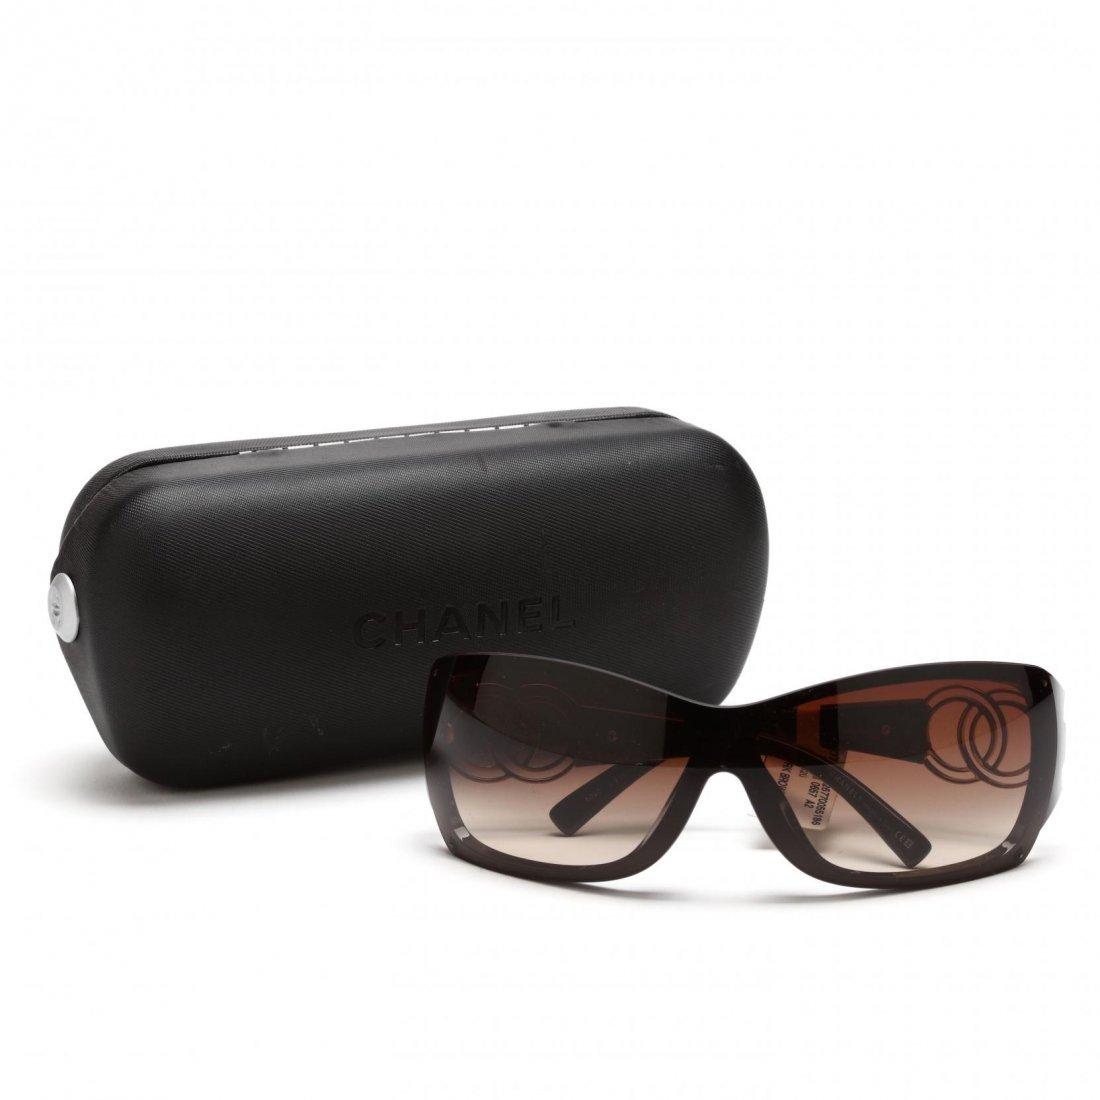 Logo Sunglasses, Chanel - 4